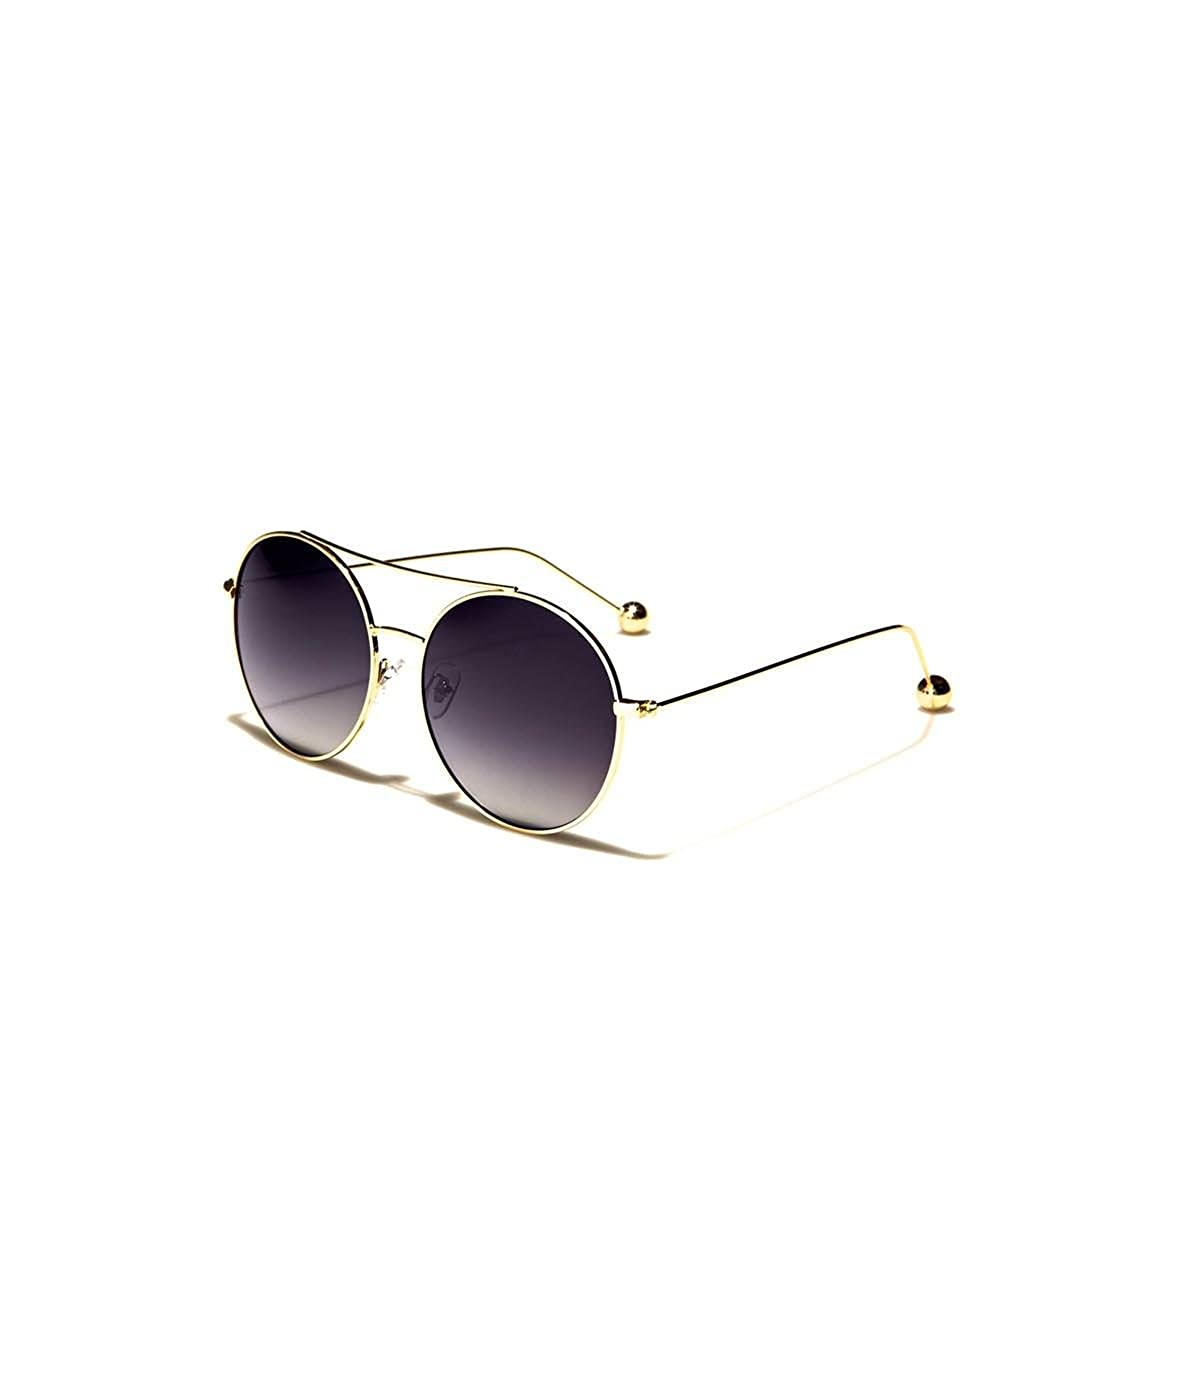 Nayked Apparel Round Aviator Sunglasses,